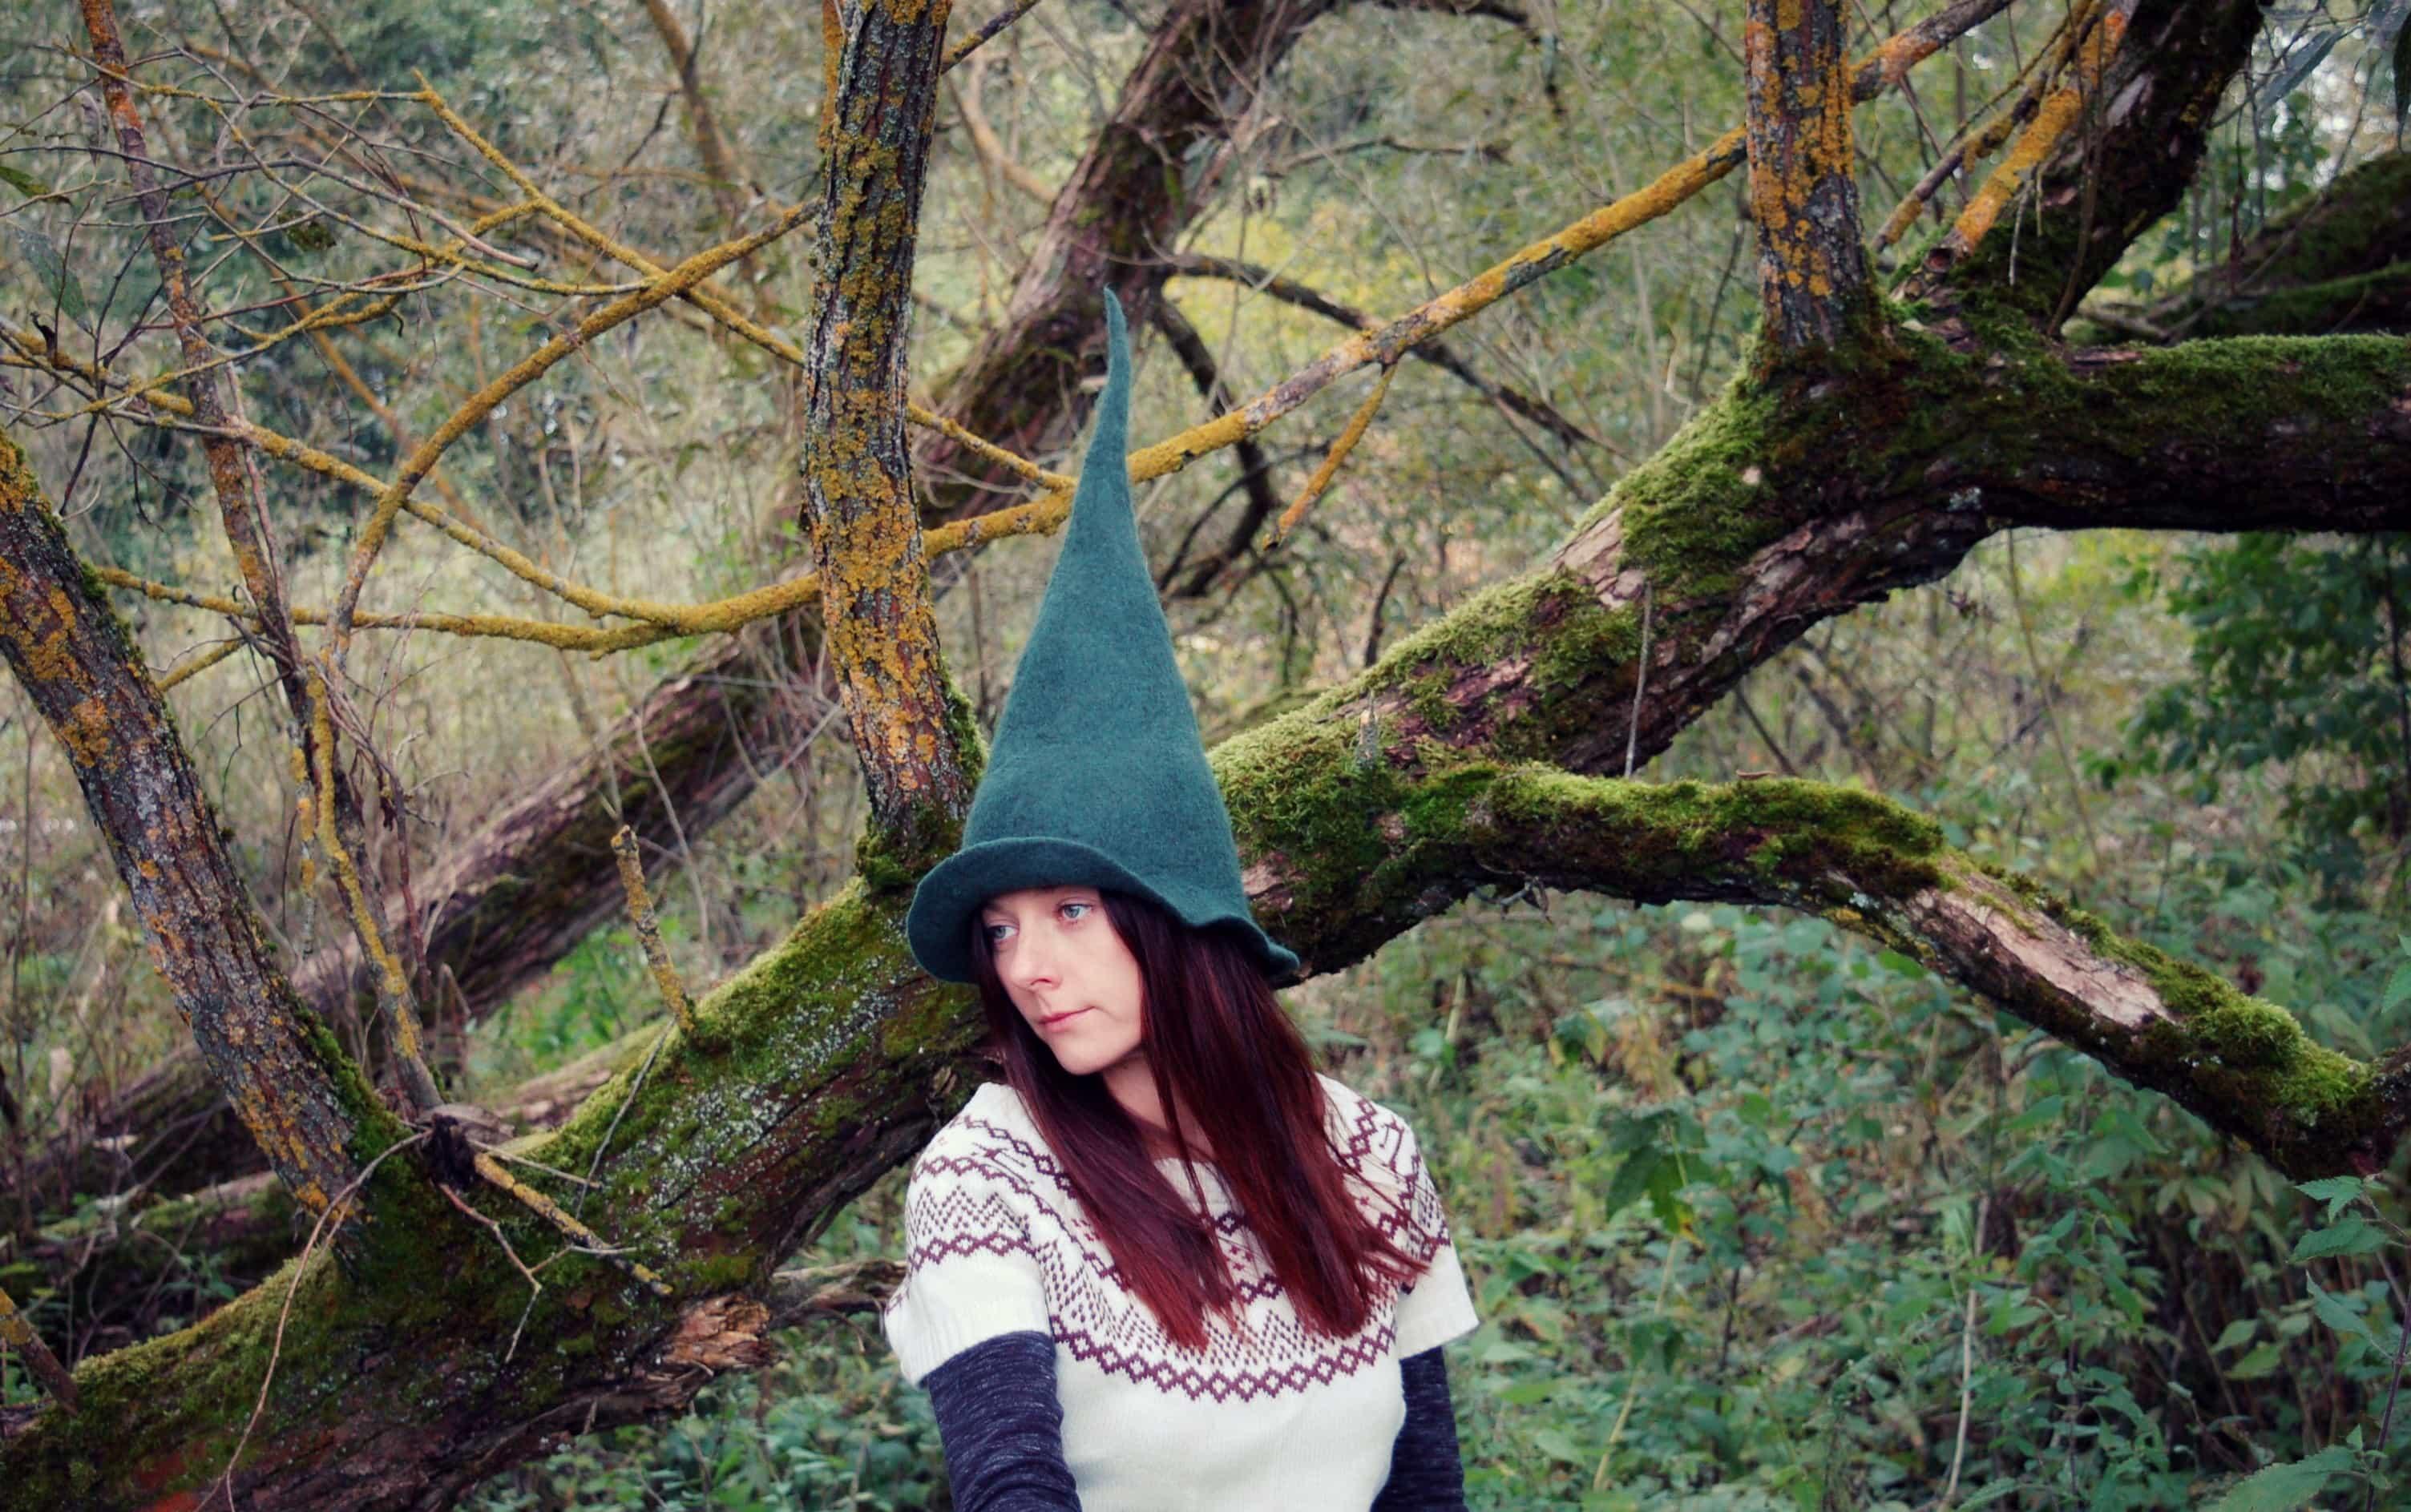 zielona czapka spiczasta